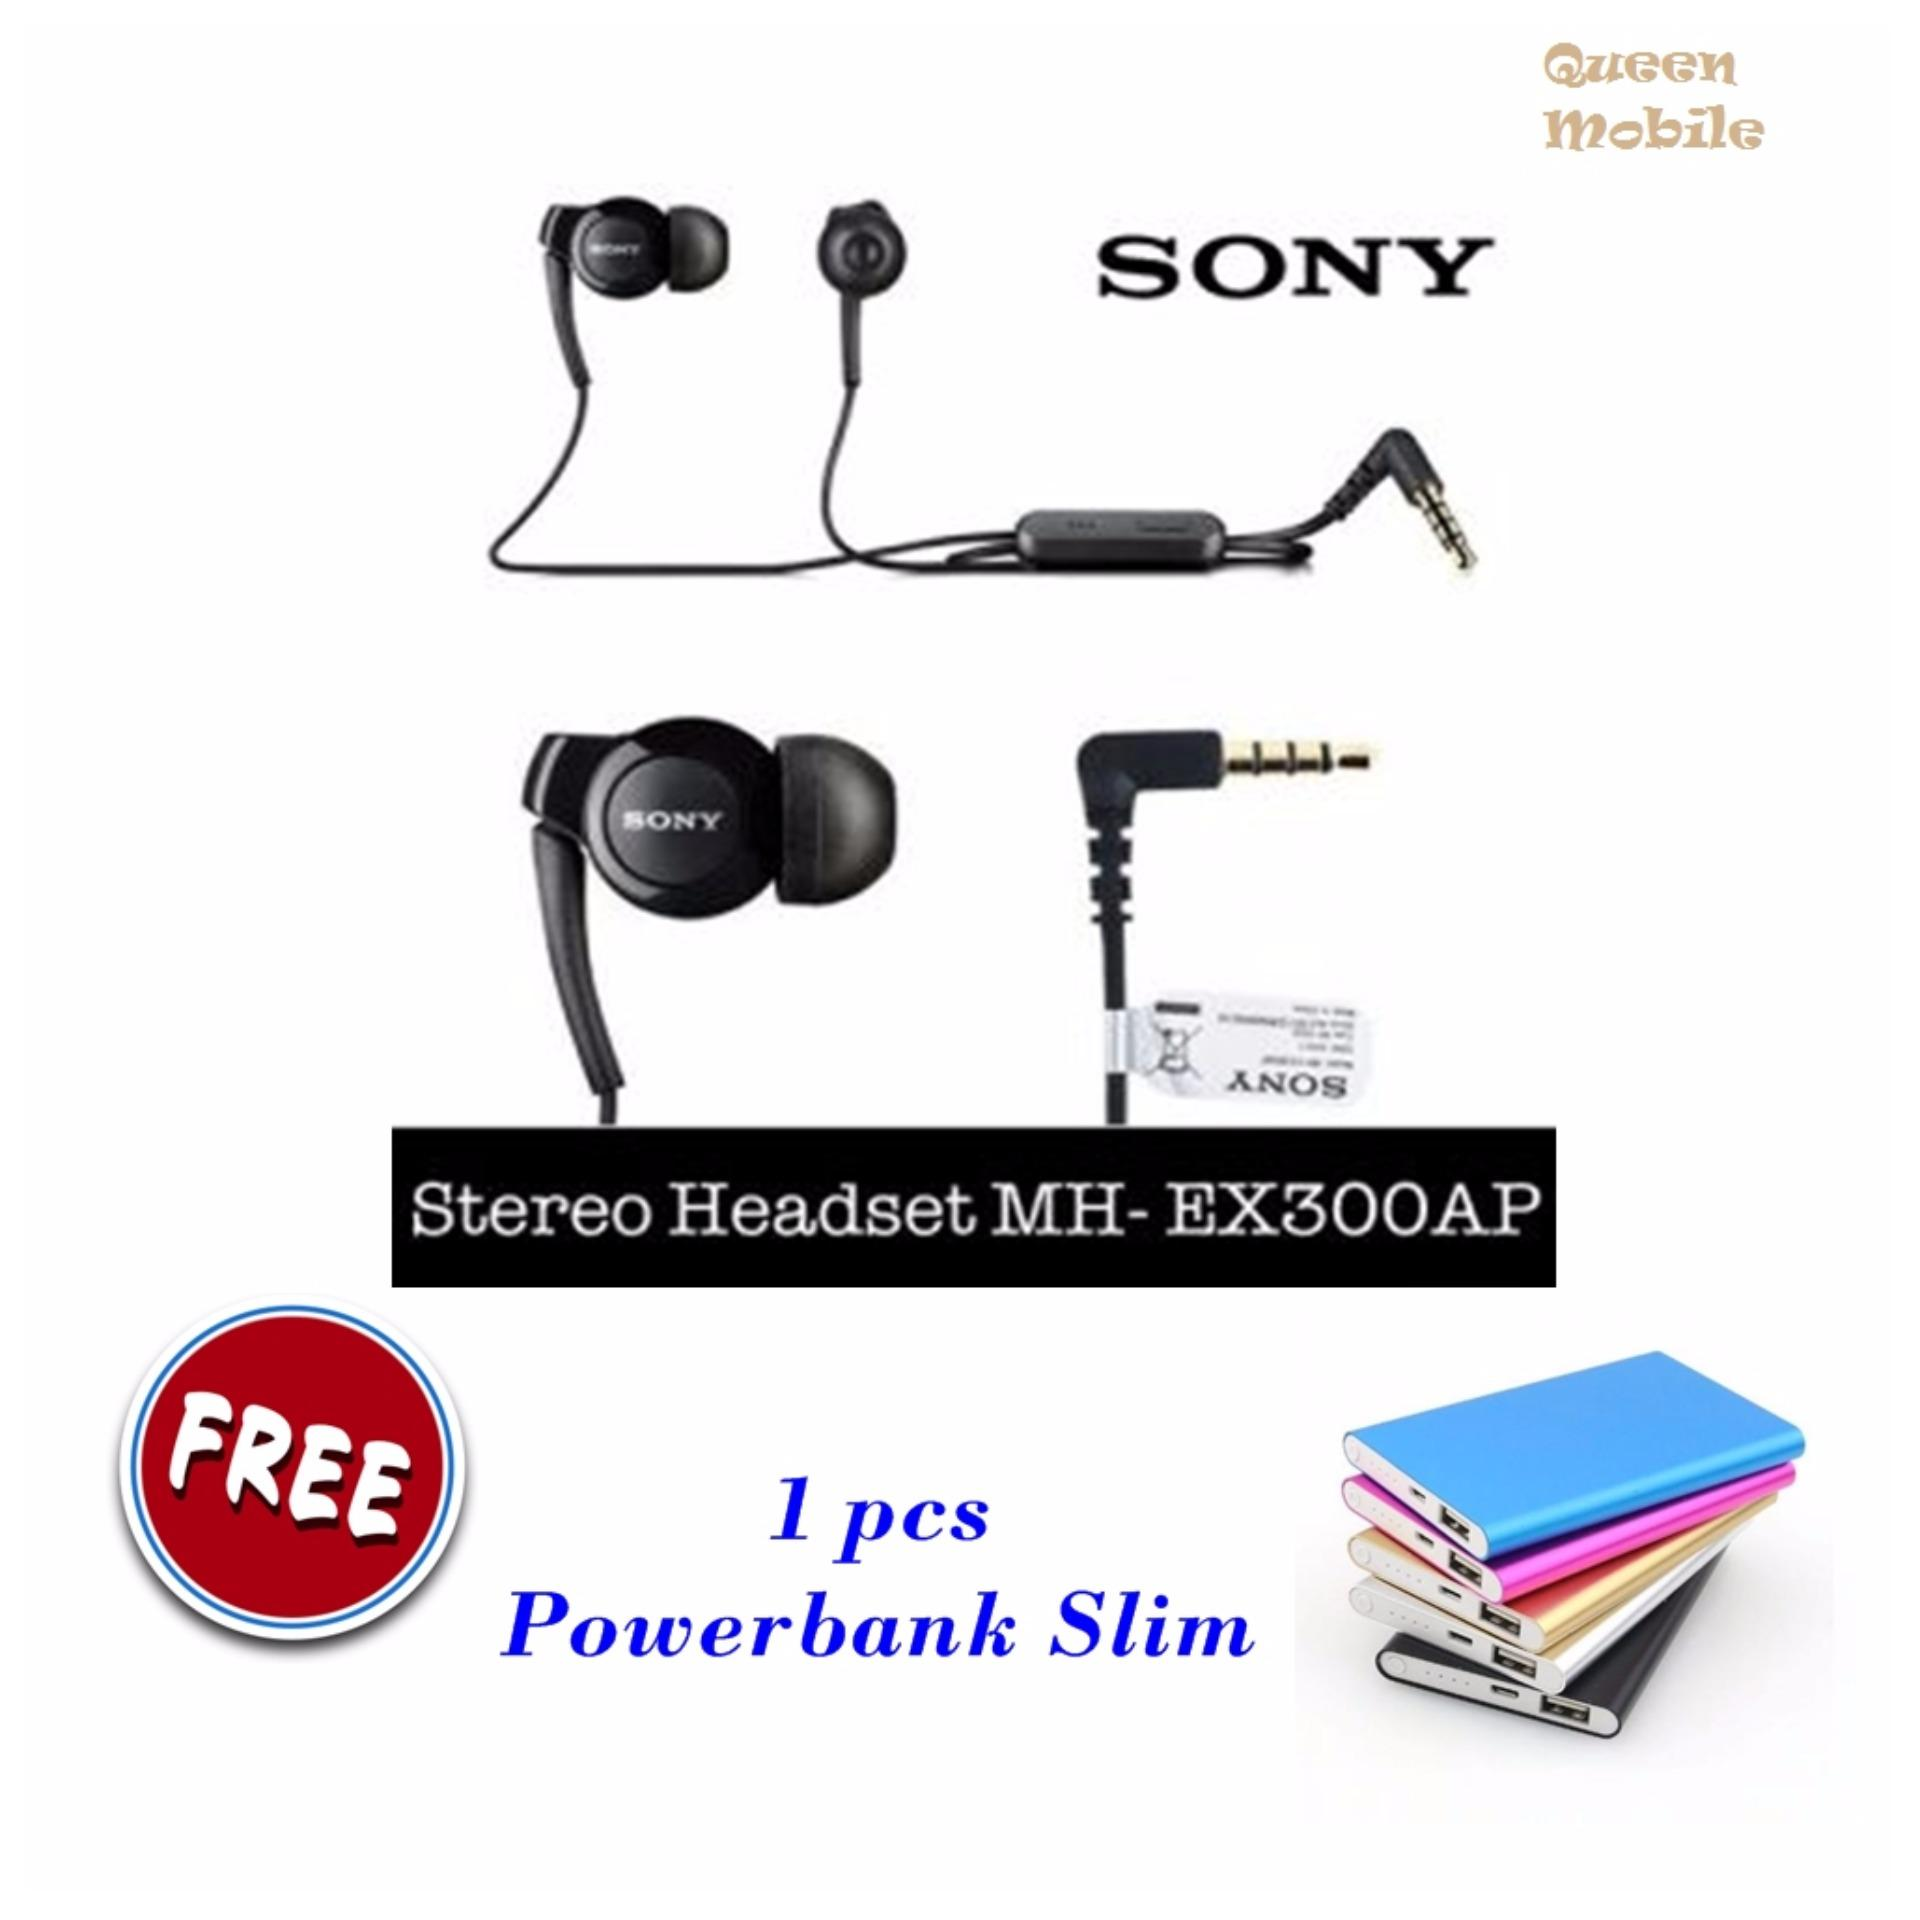 Spesifikasi Sony Stereo Headset Mdr 700Ap Powerbank Slim Sony